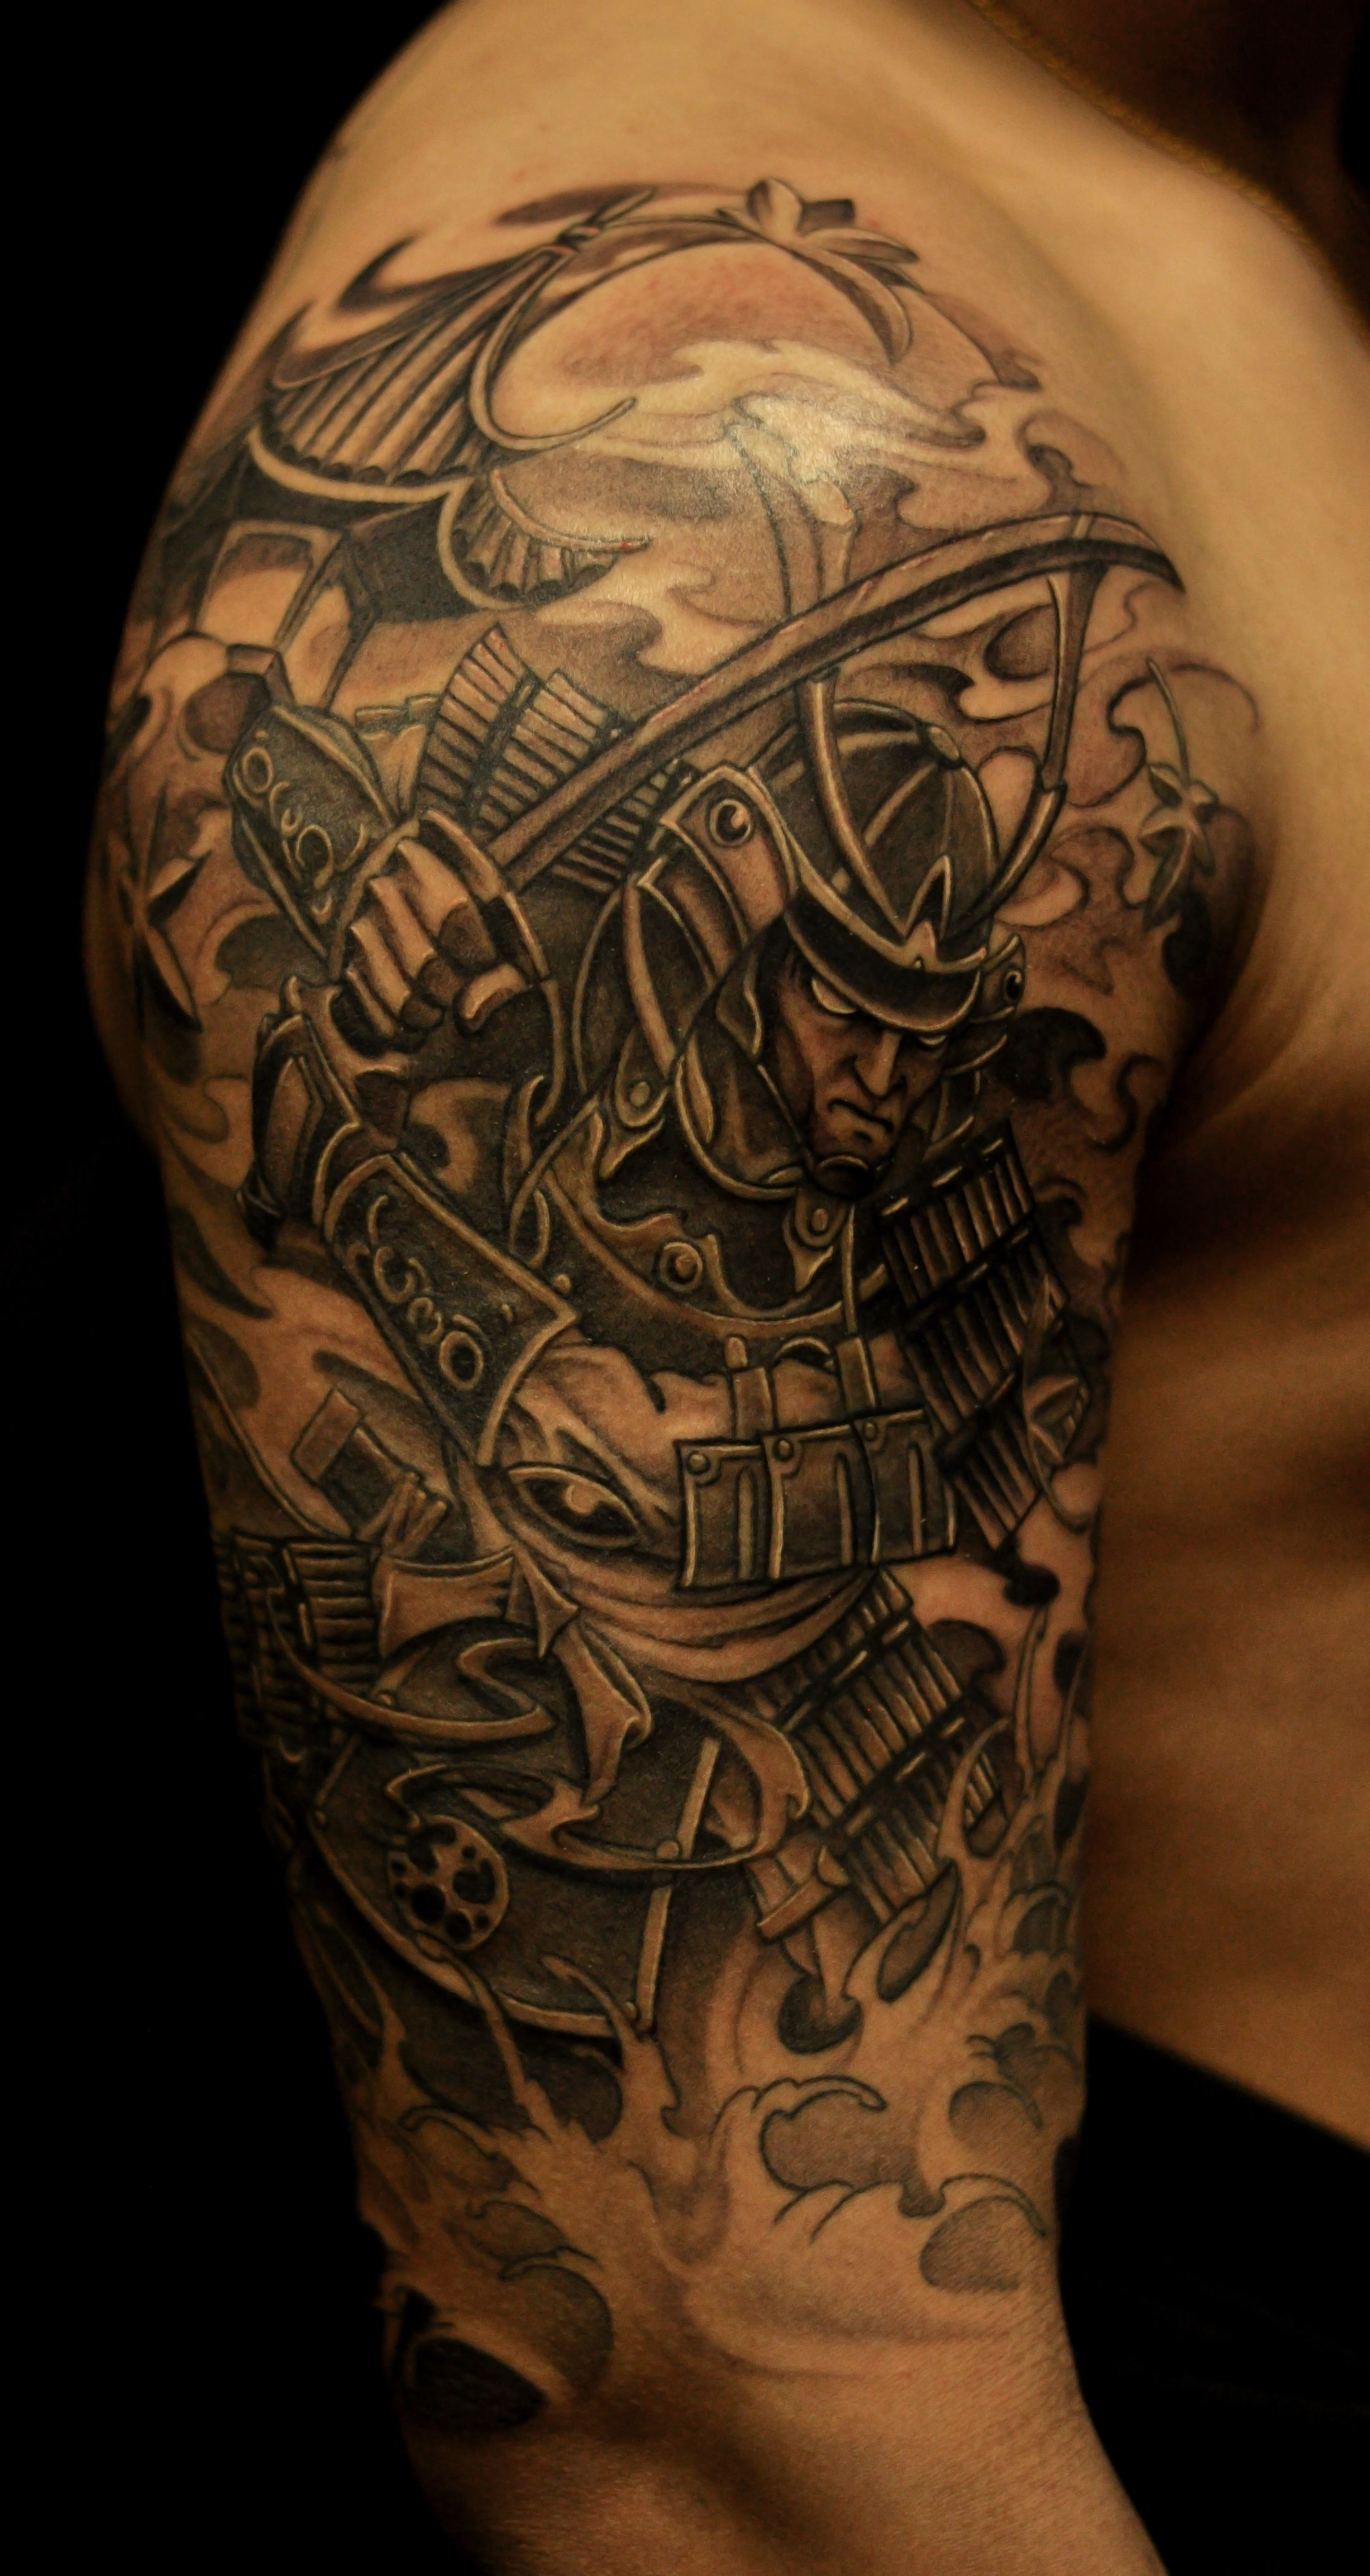 e71a7296c samurai tattoos | Half sleeve Samurai and Pagoda tattoo | Projects ...